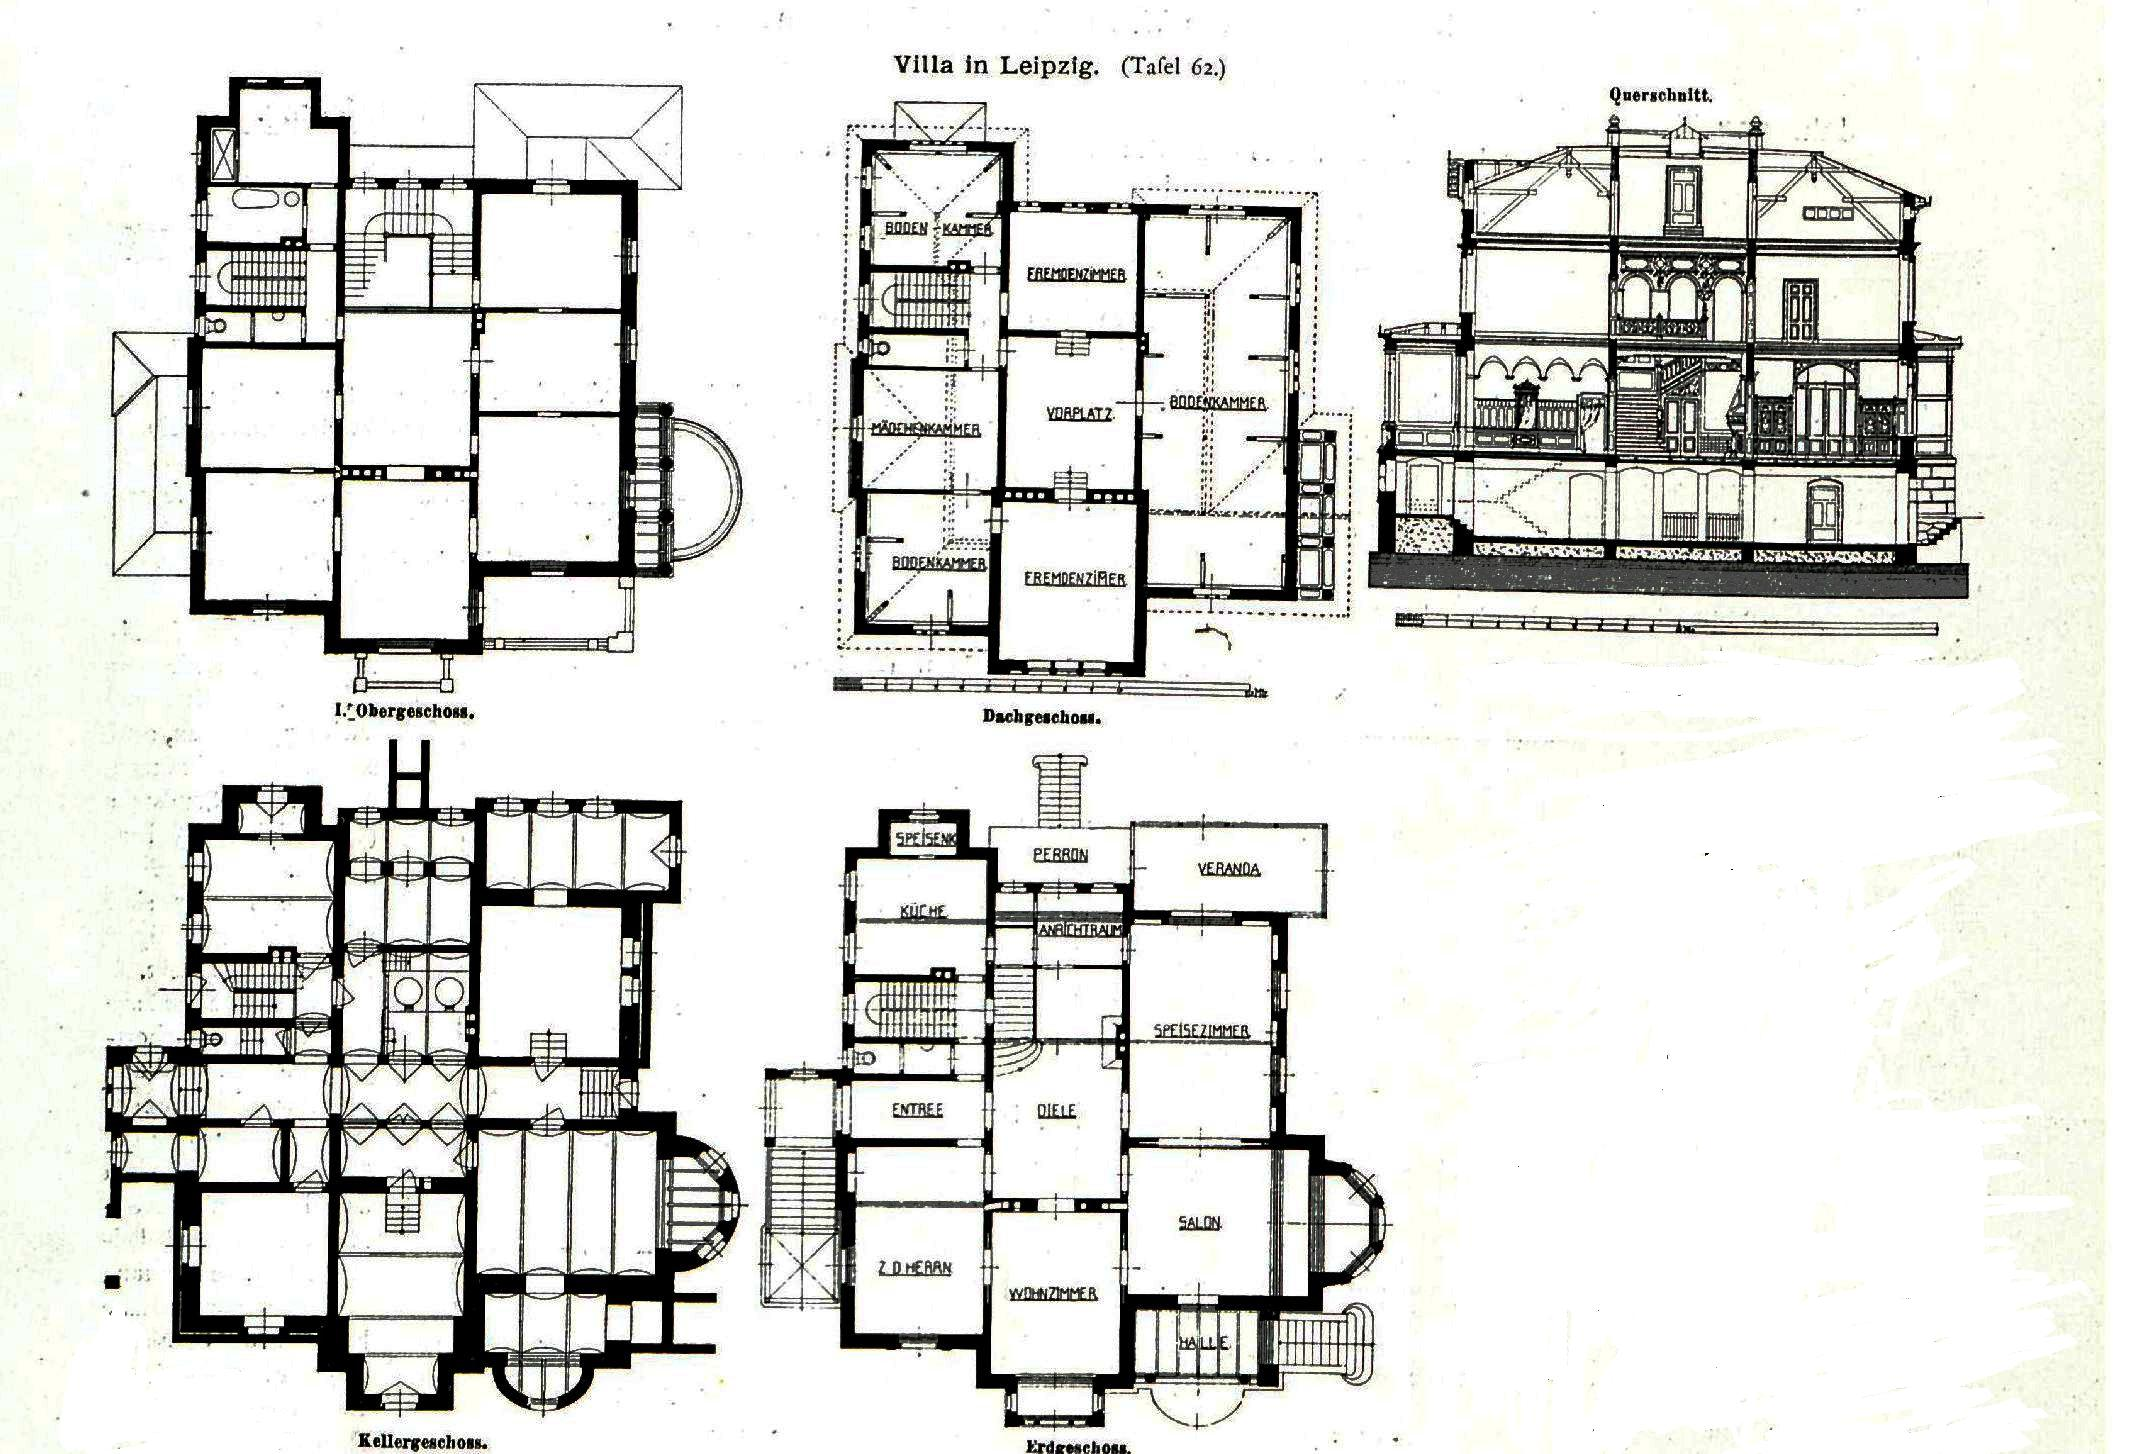 floorplan on pinterest mansion floor plans ground floor and british history. Black Bedroom Furniture Sets. Home Design Ideas